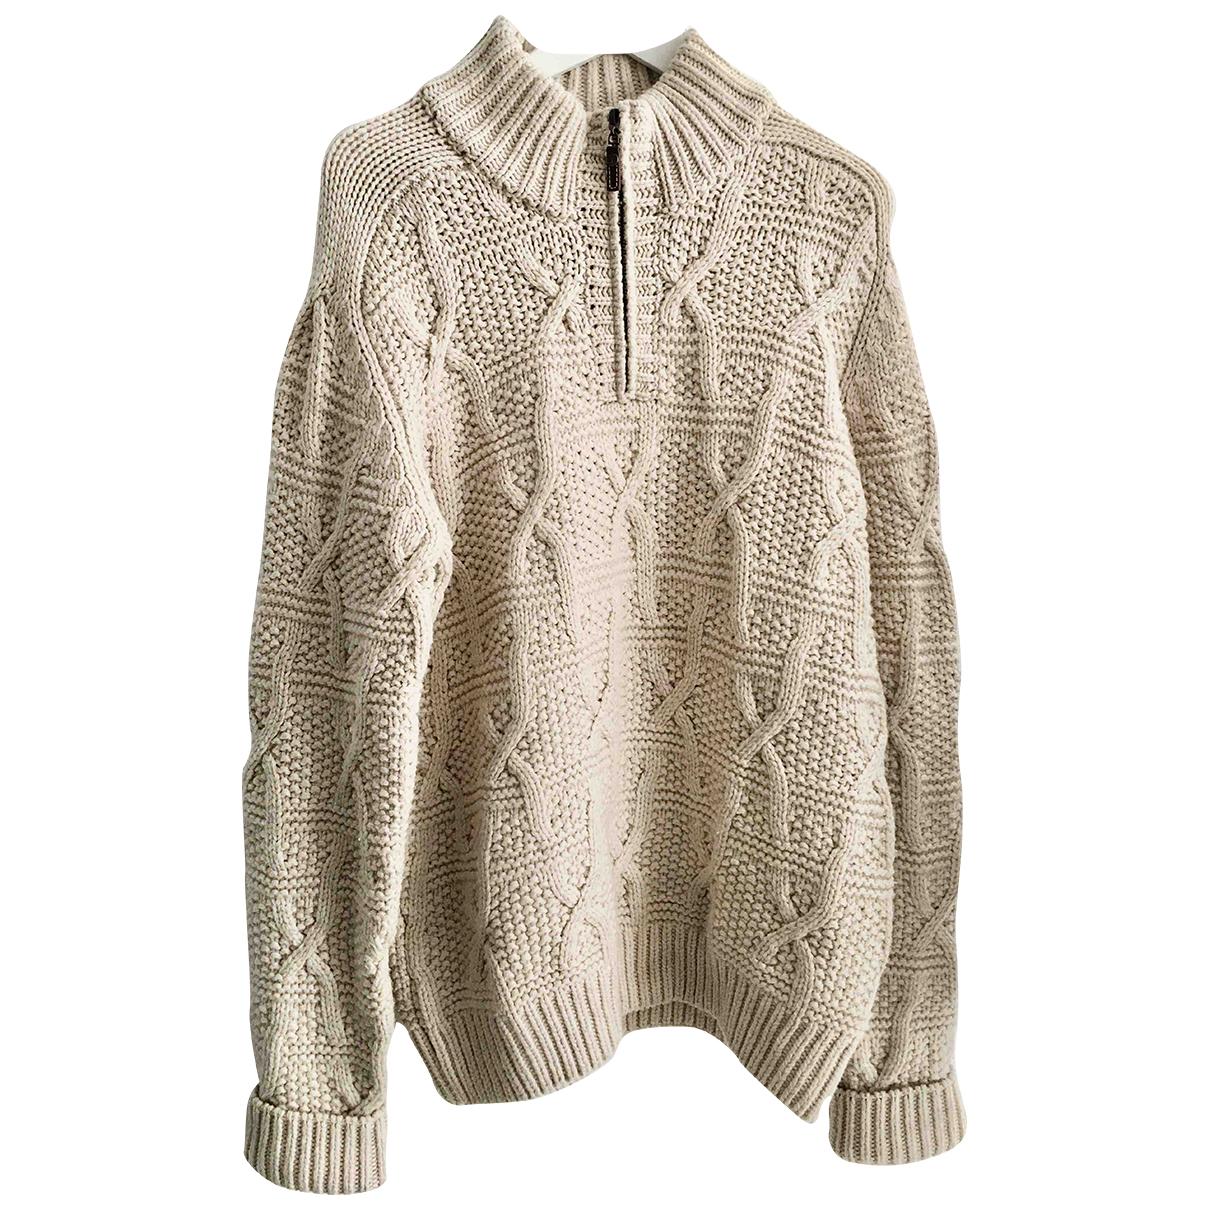 Timberland N Ecru Wool Knitwear & Sweatshirts for Men L International